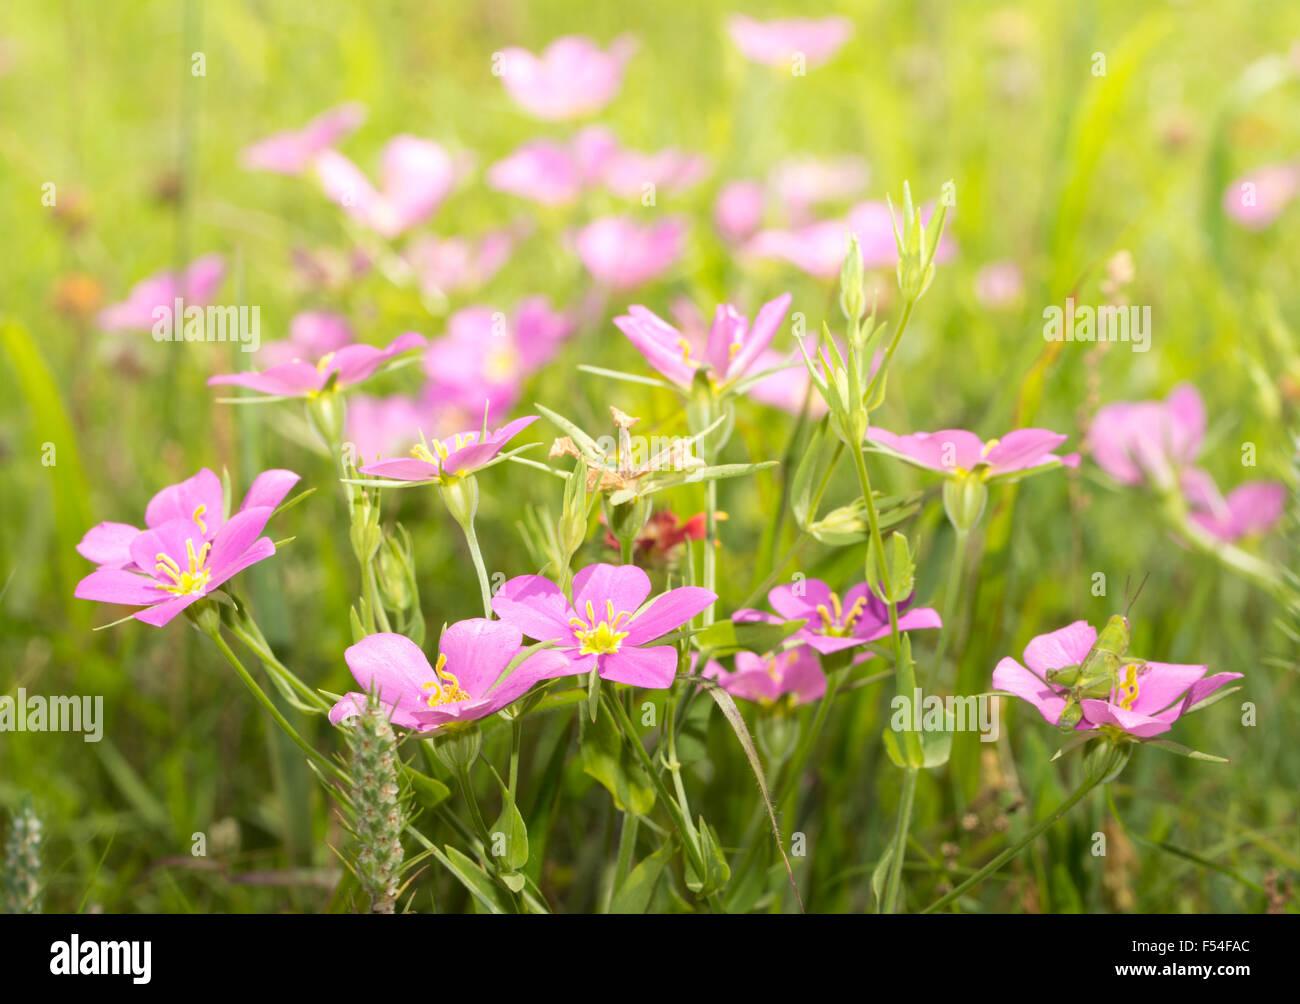 Meadow Pink Sabatia Campestris Flowers Growing On A Sunny Summer